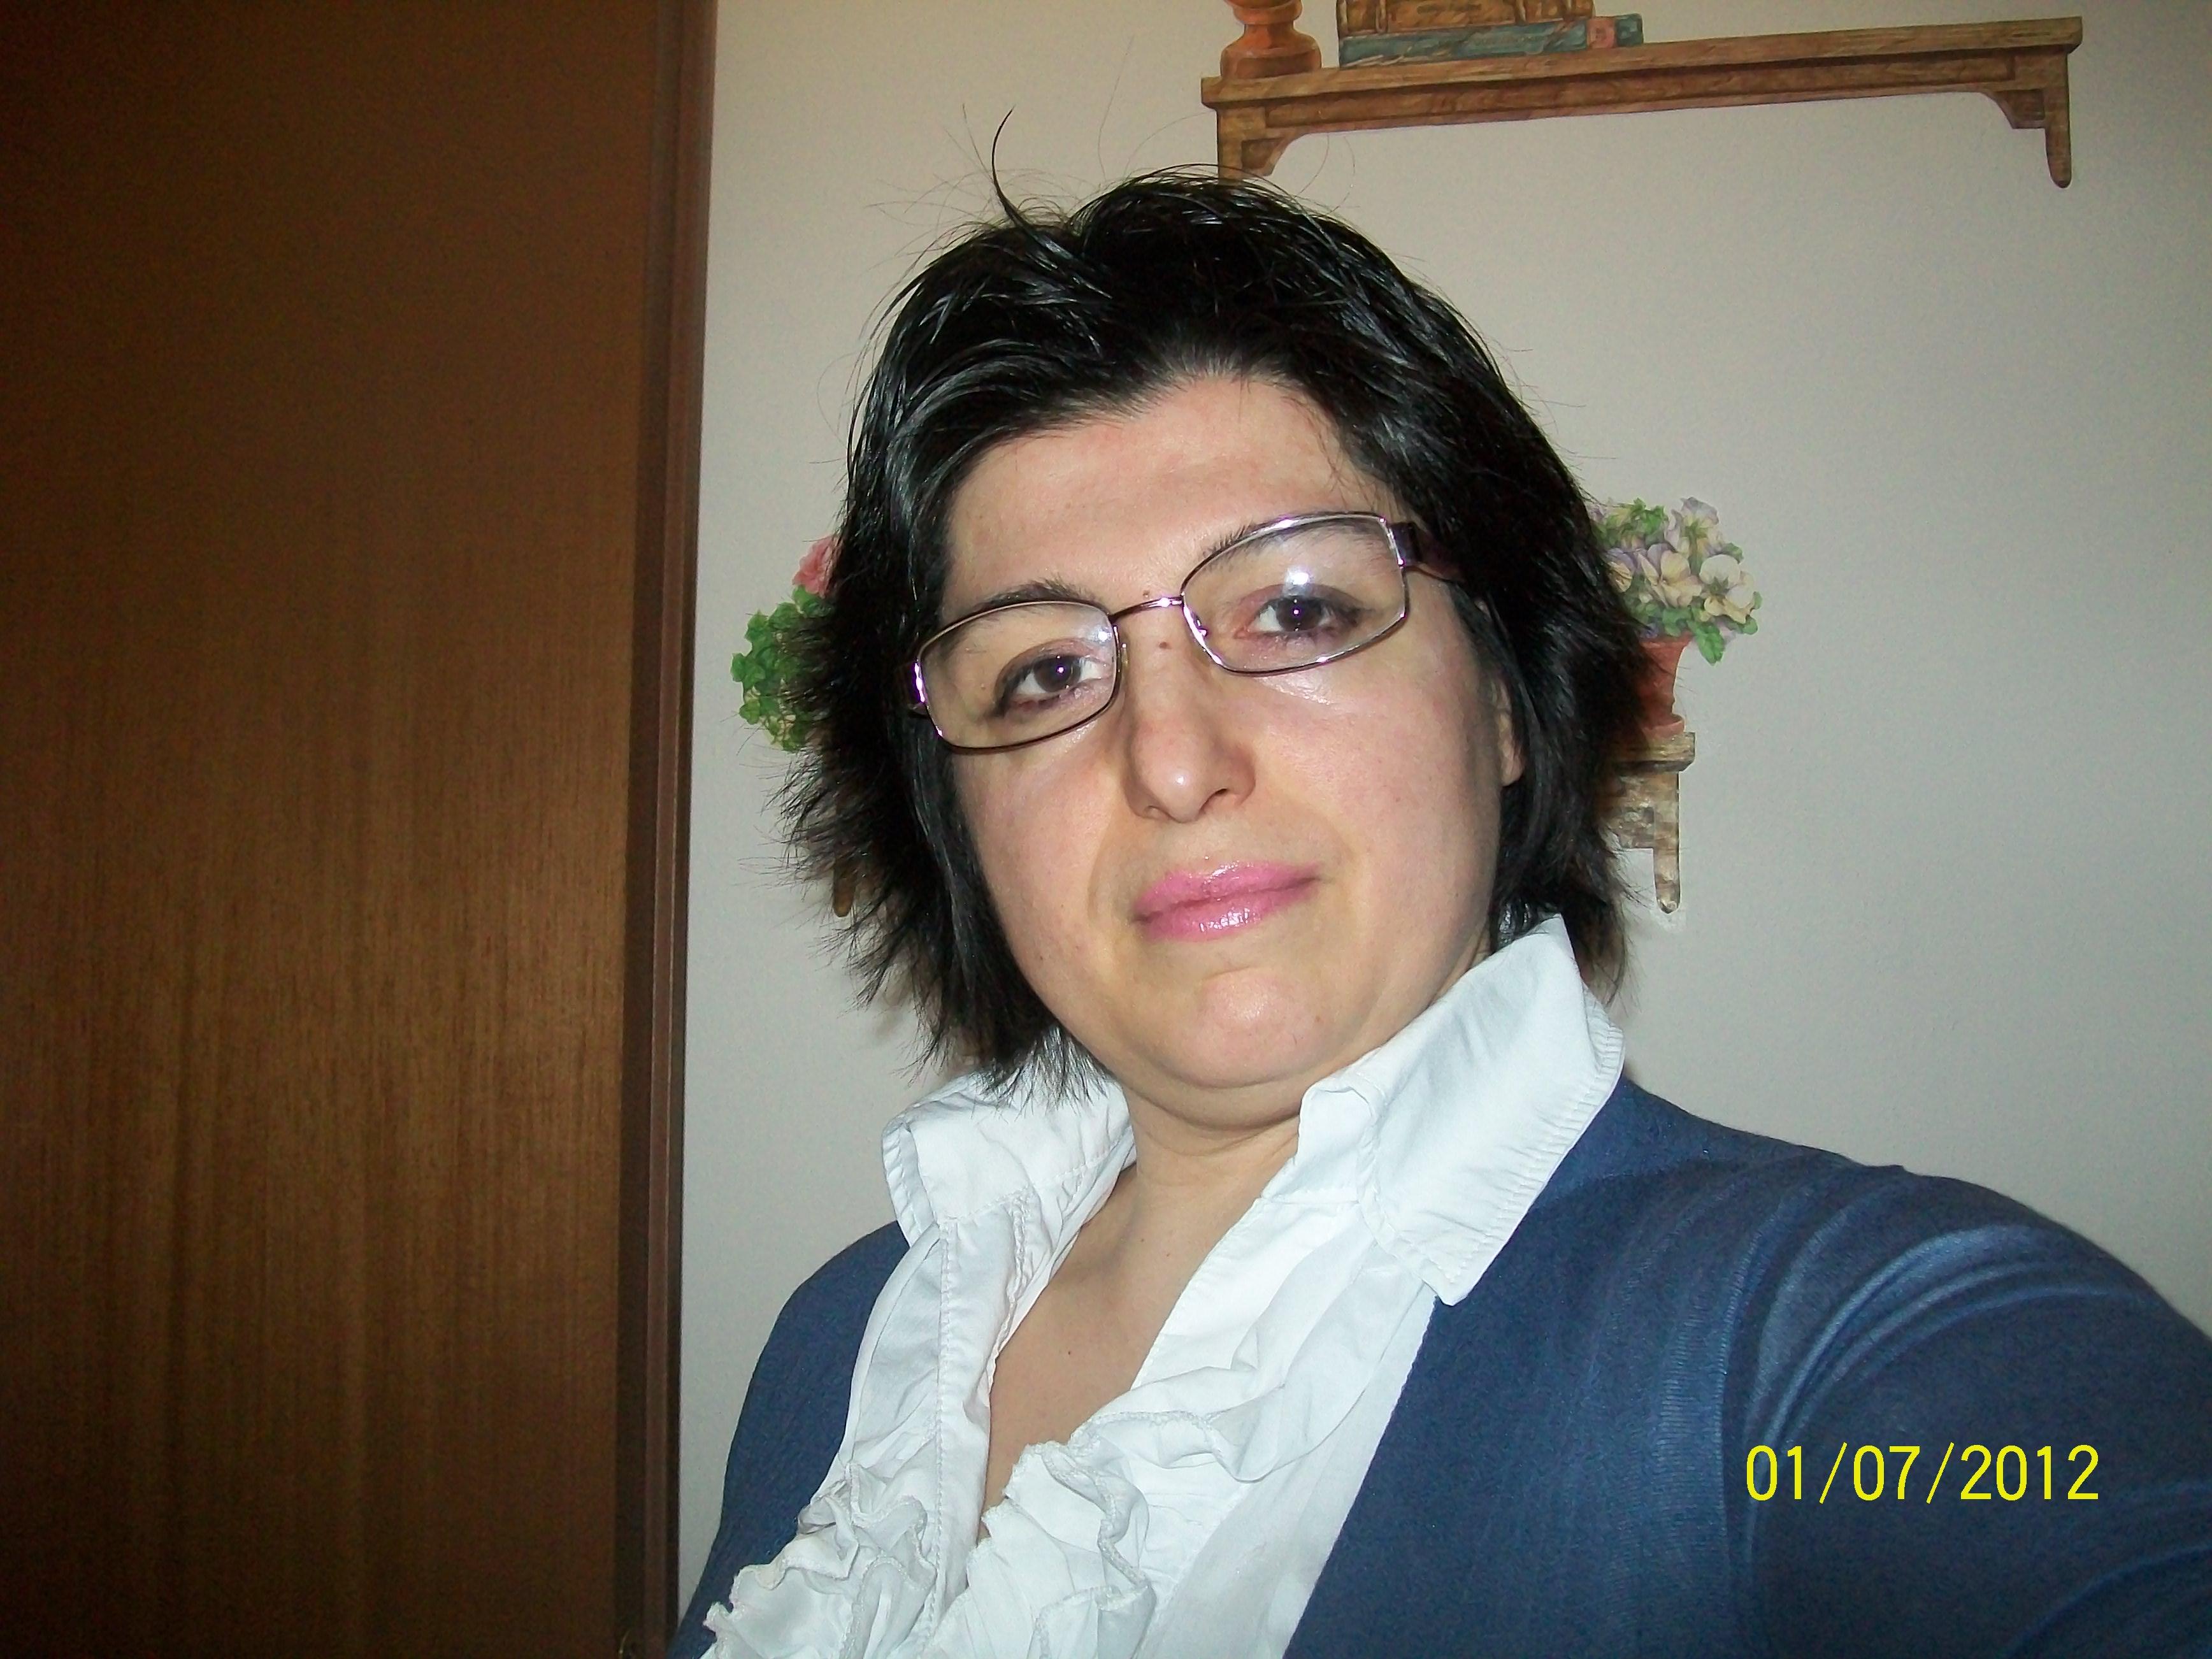 Vania Graziani